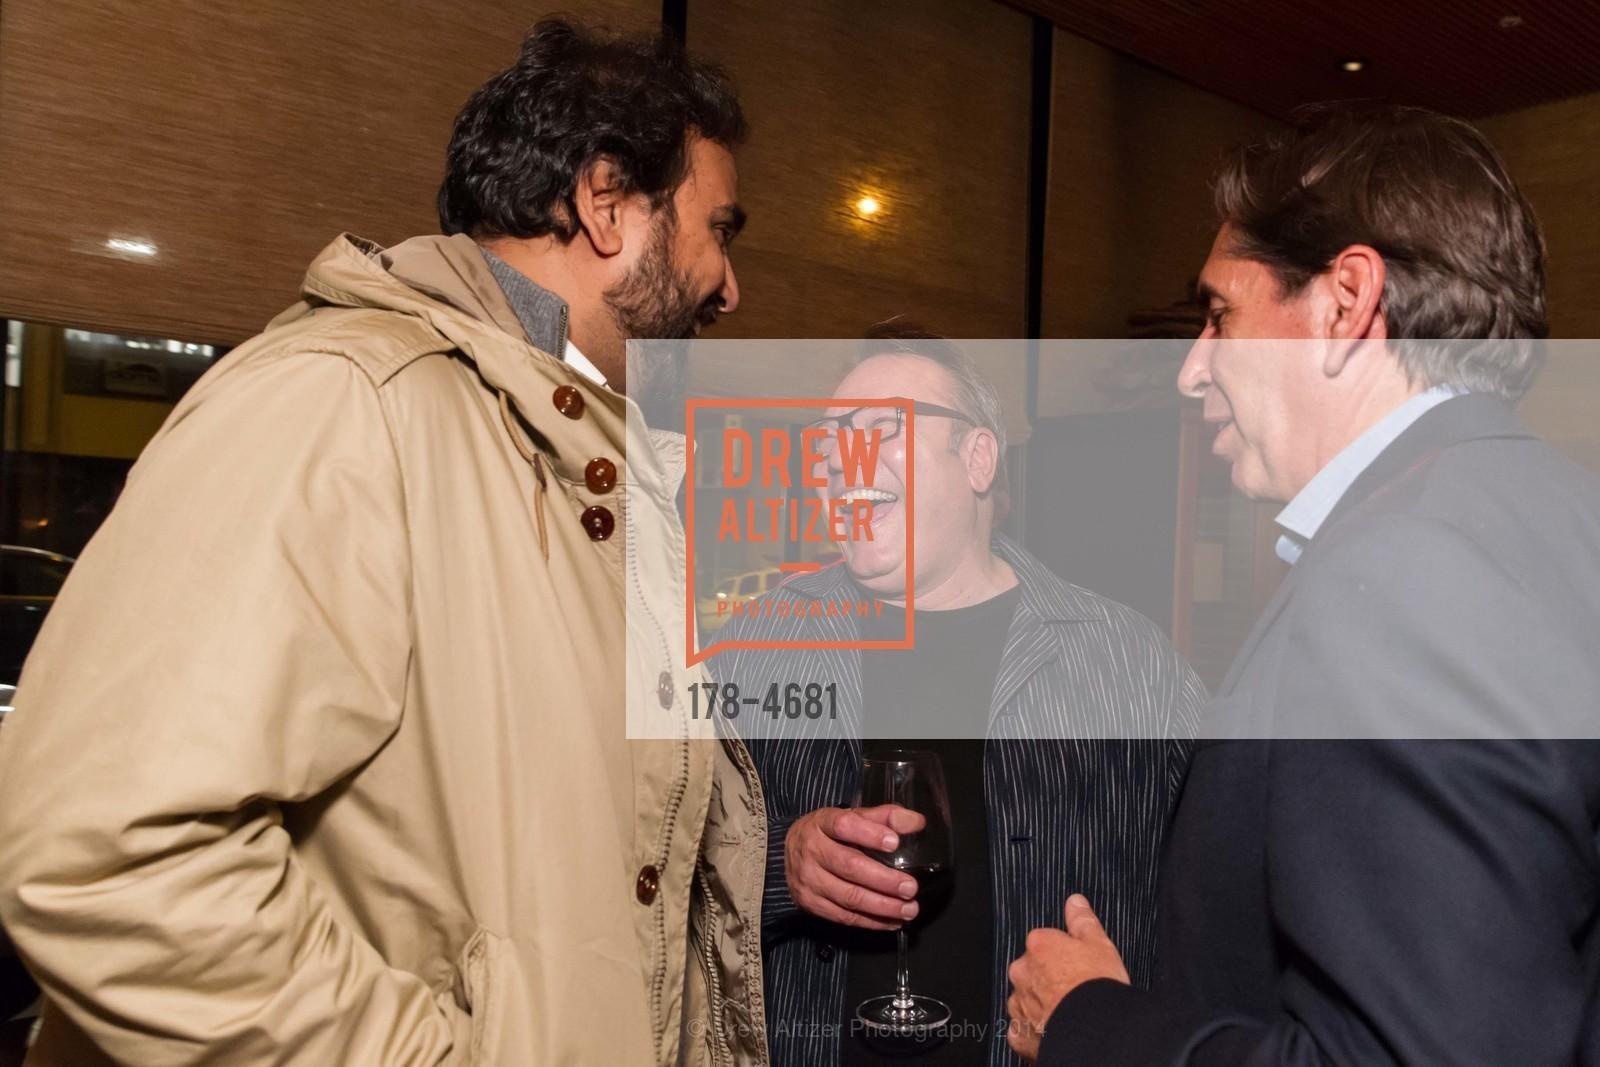 Hosain Rahman, Stanlee Gatti, Jorge Ruiz, Photo #178-4681